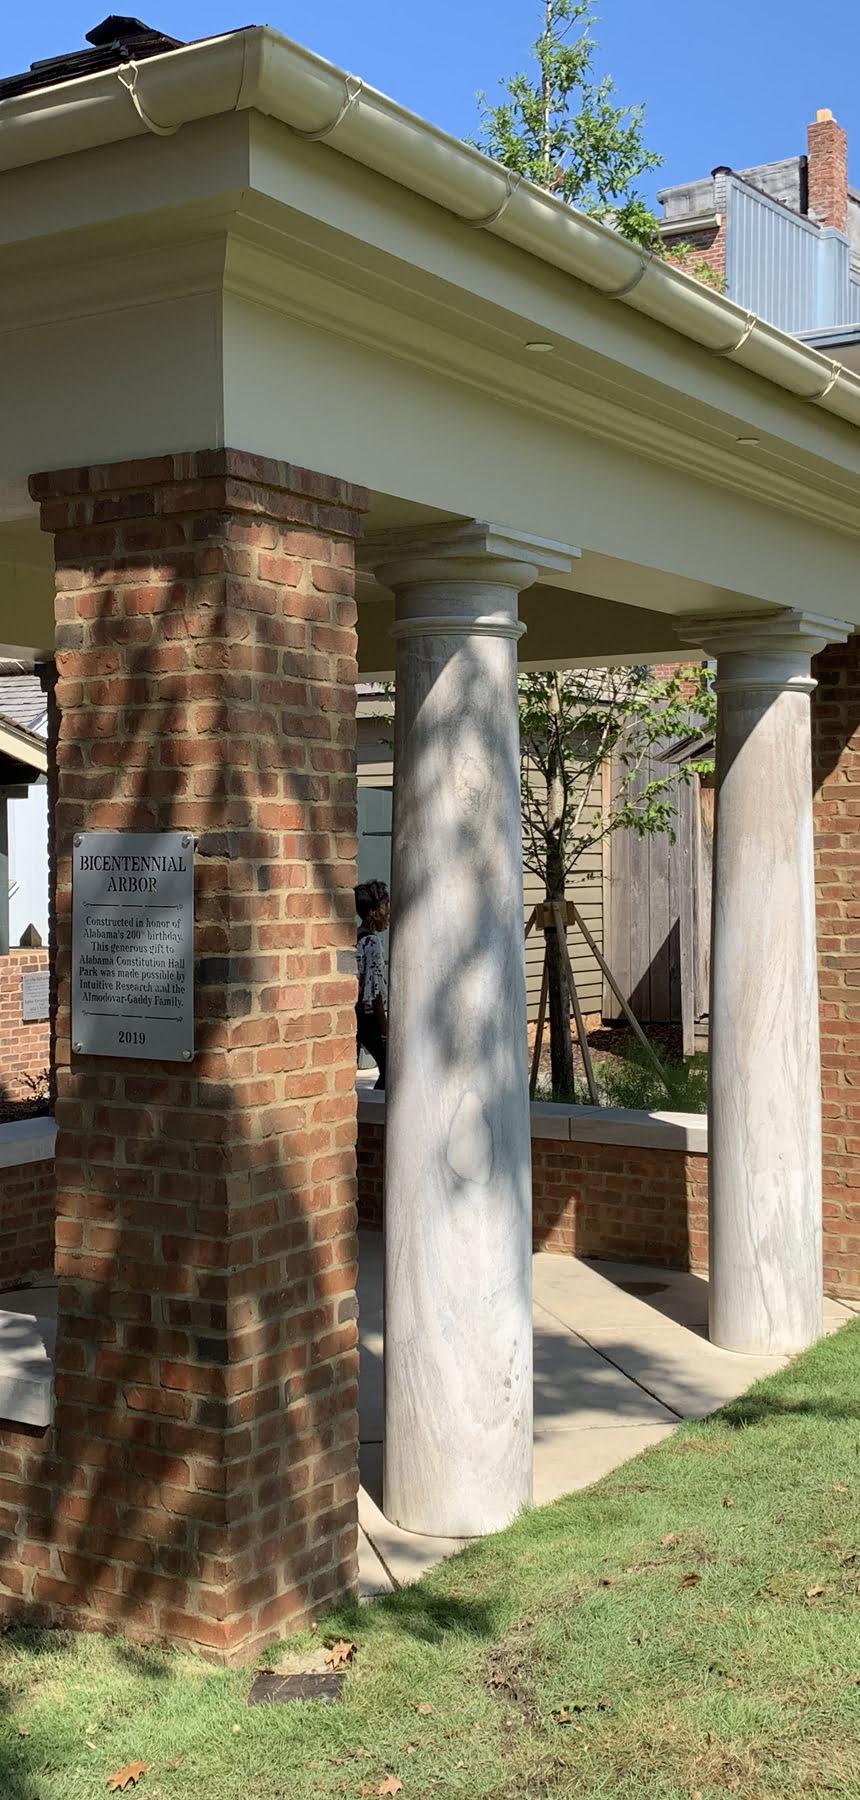 Constitution Hall Park Small Pavillion (860x1800)